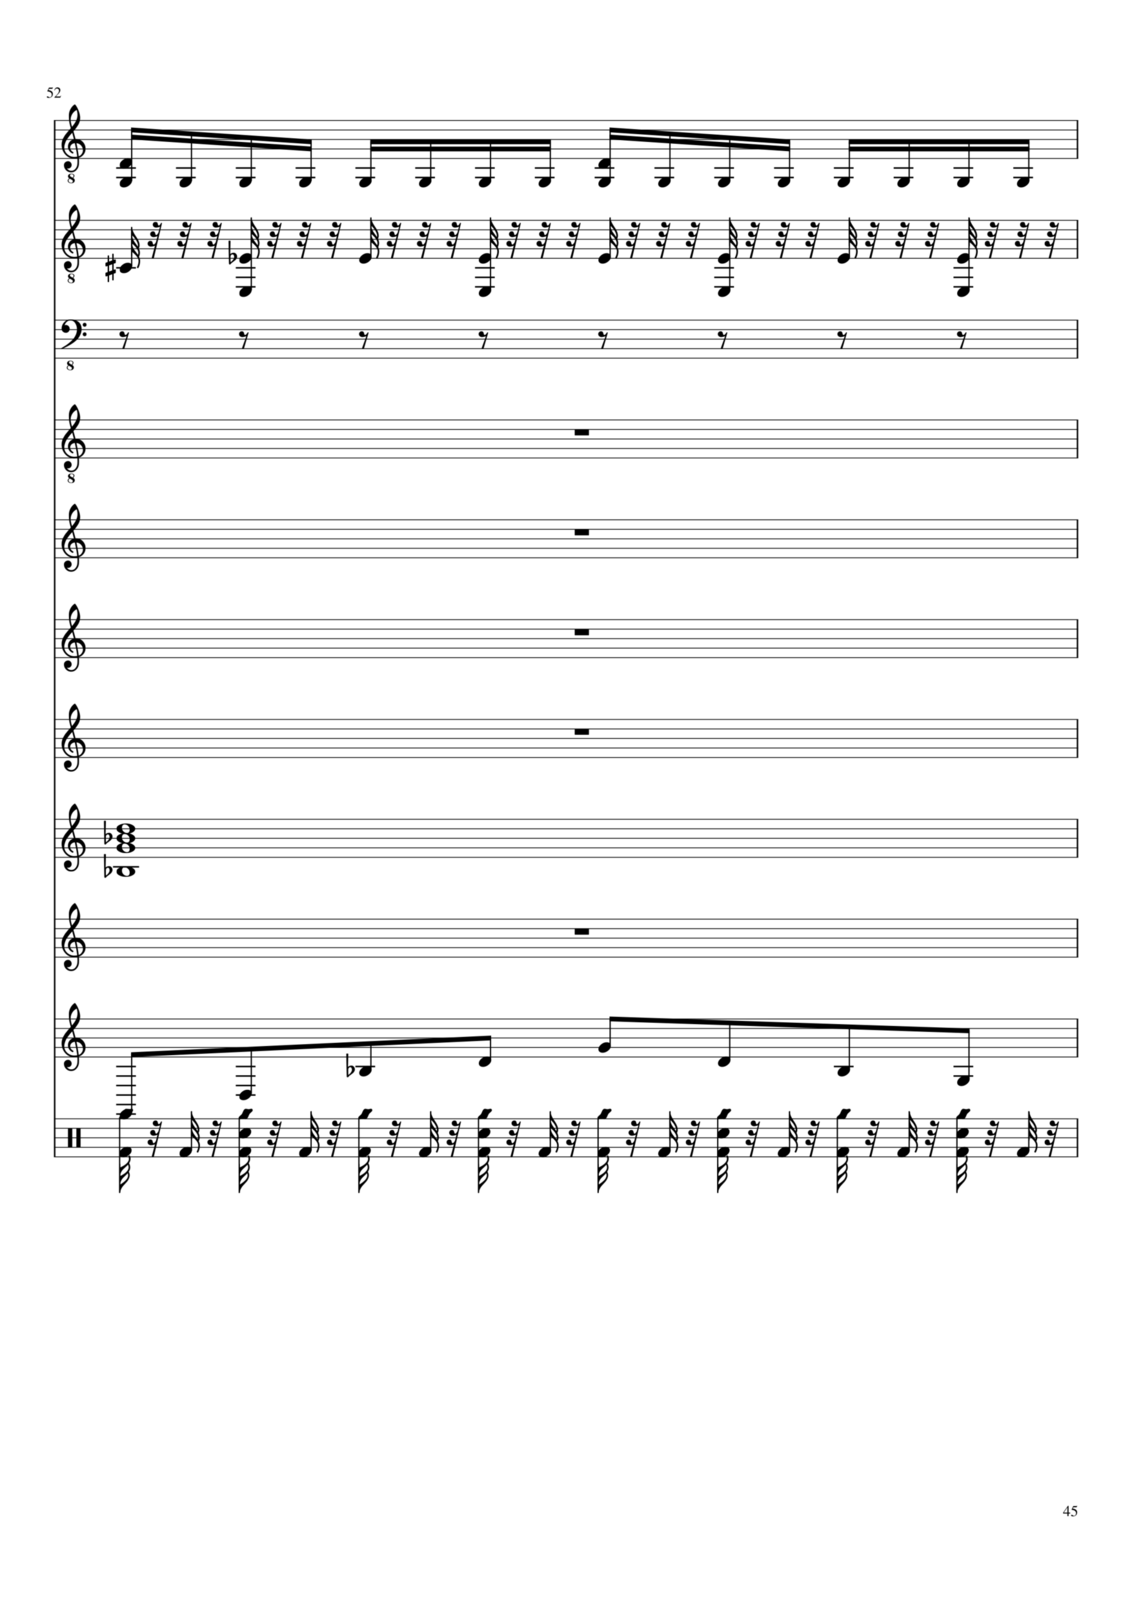 Belyiy sokol slide, Image 45